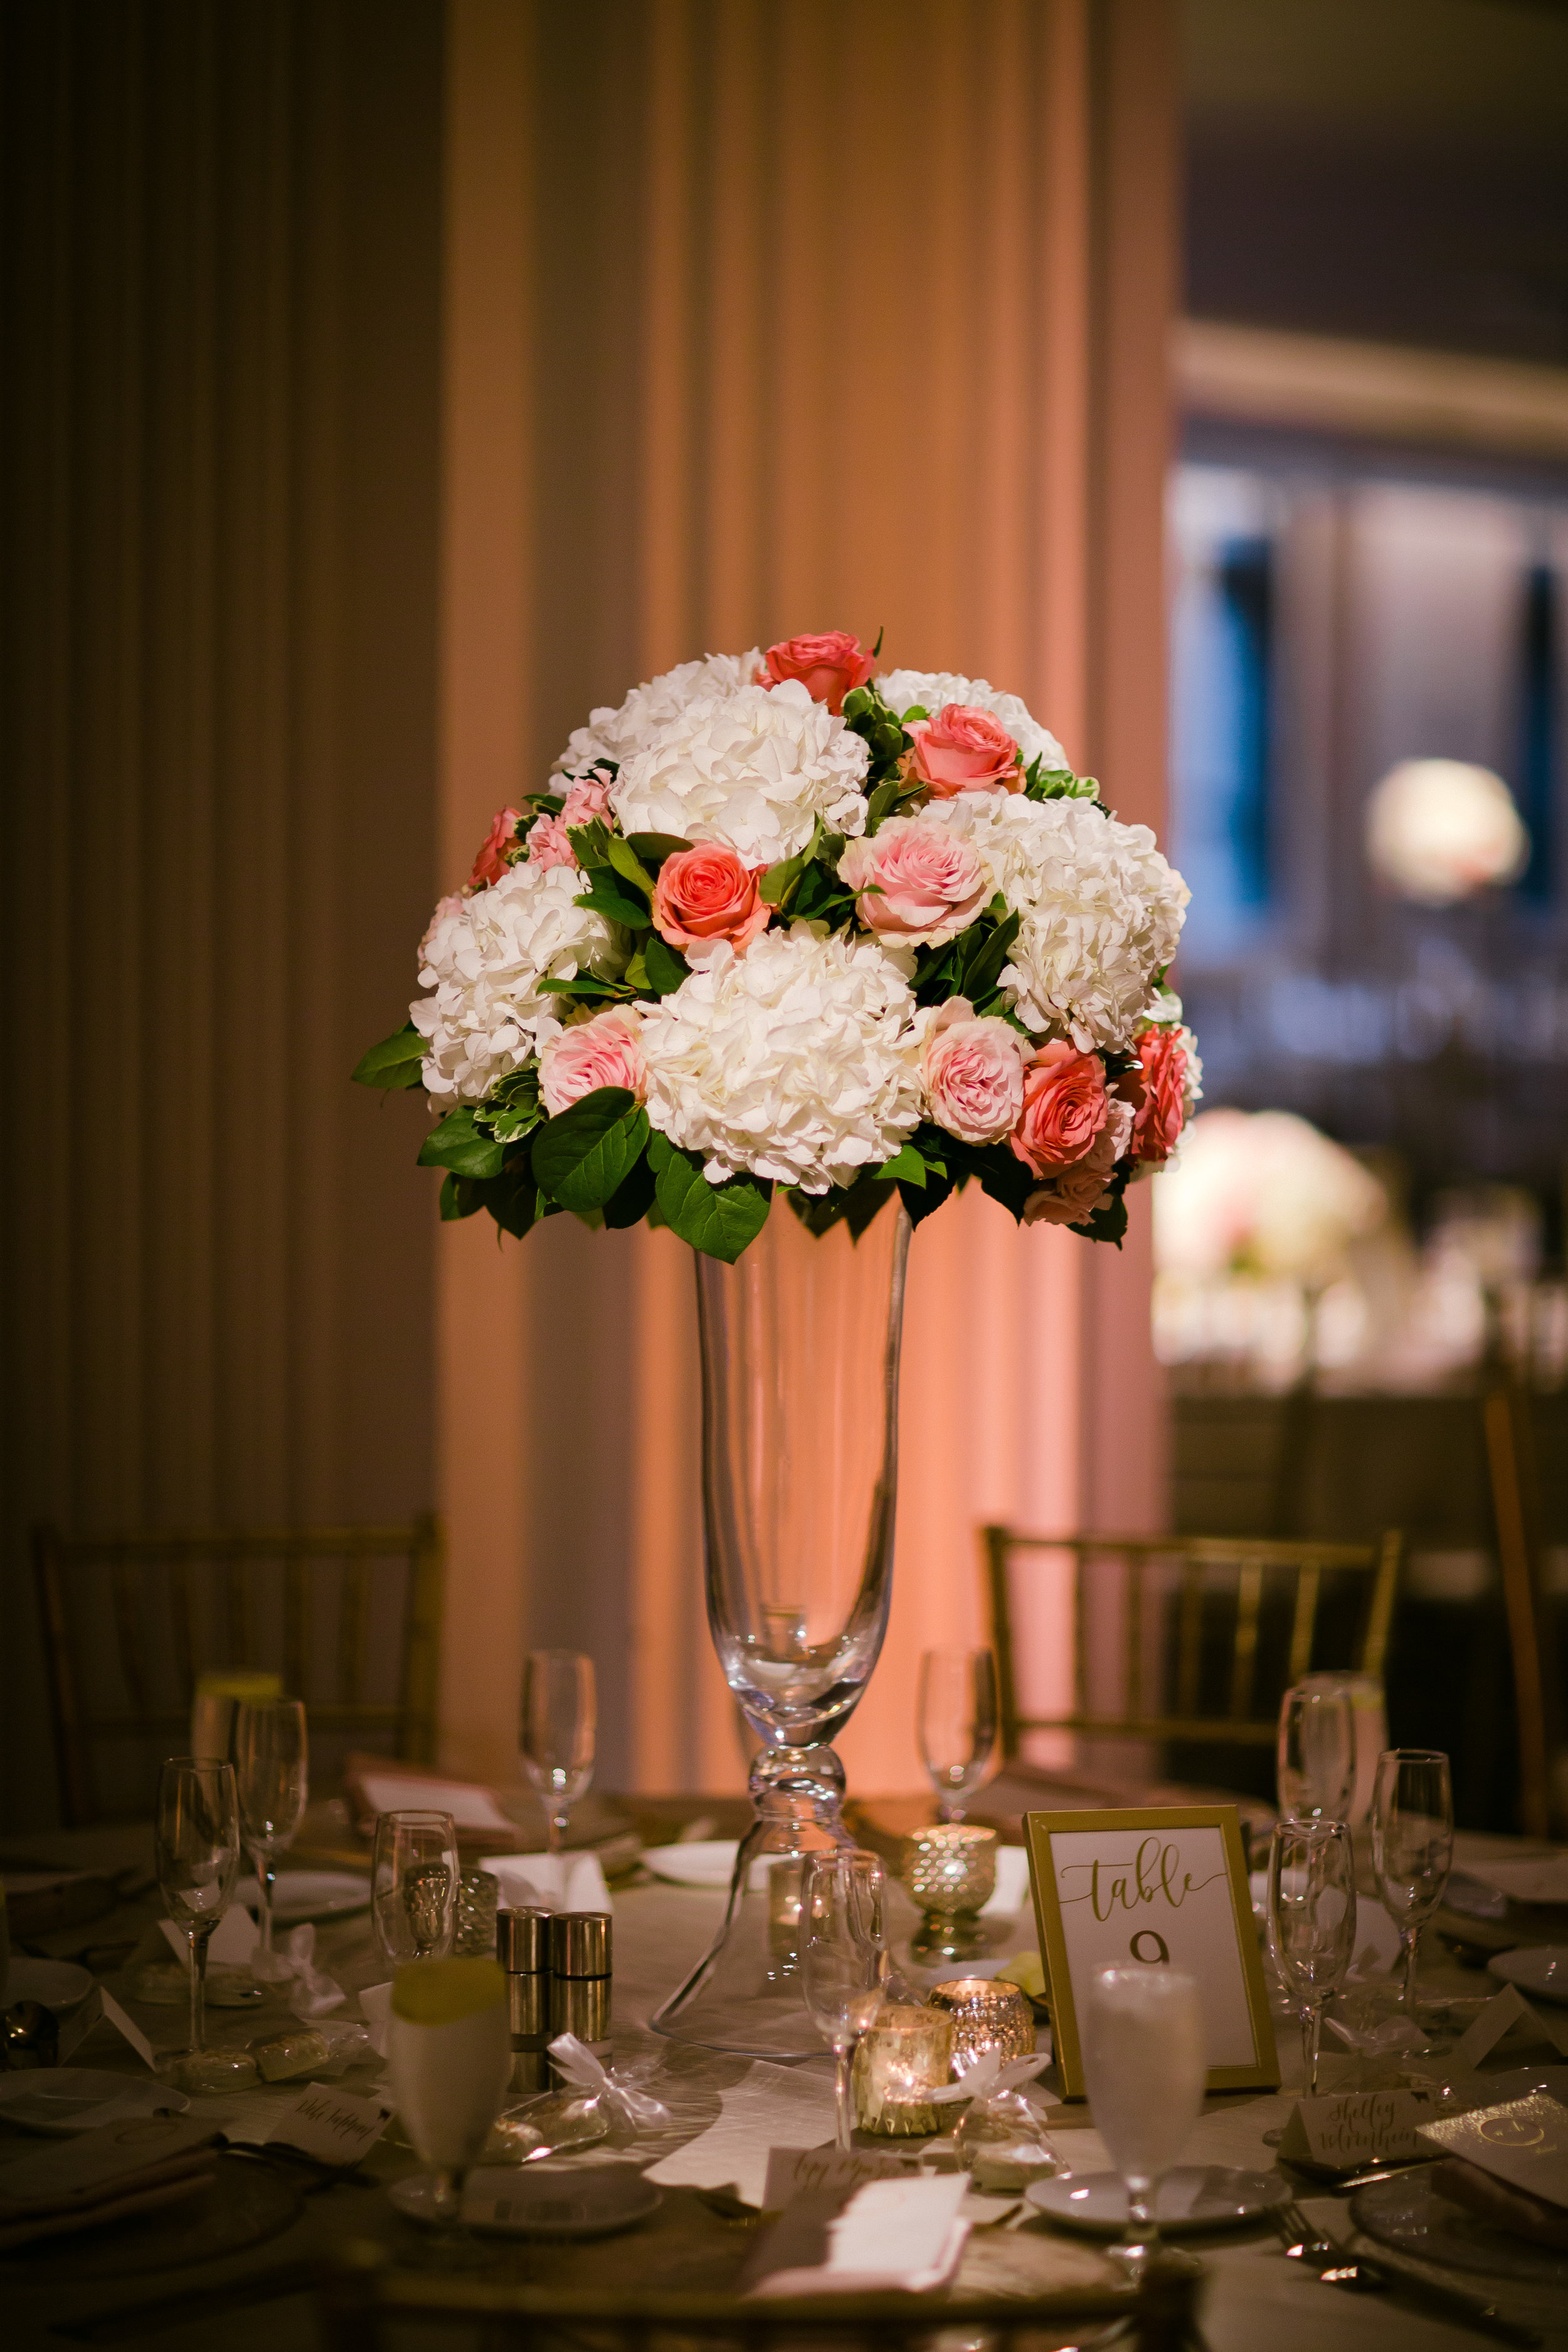 Burnham Hall wedding reception with blush and cream palette